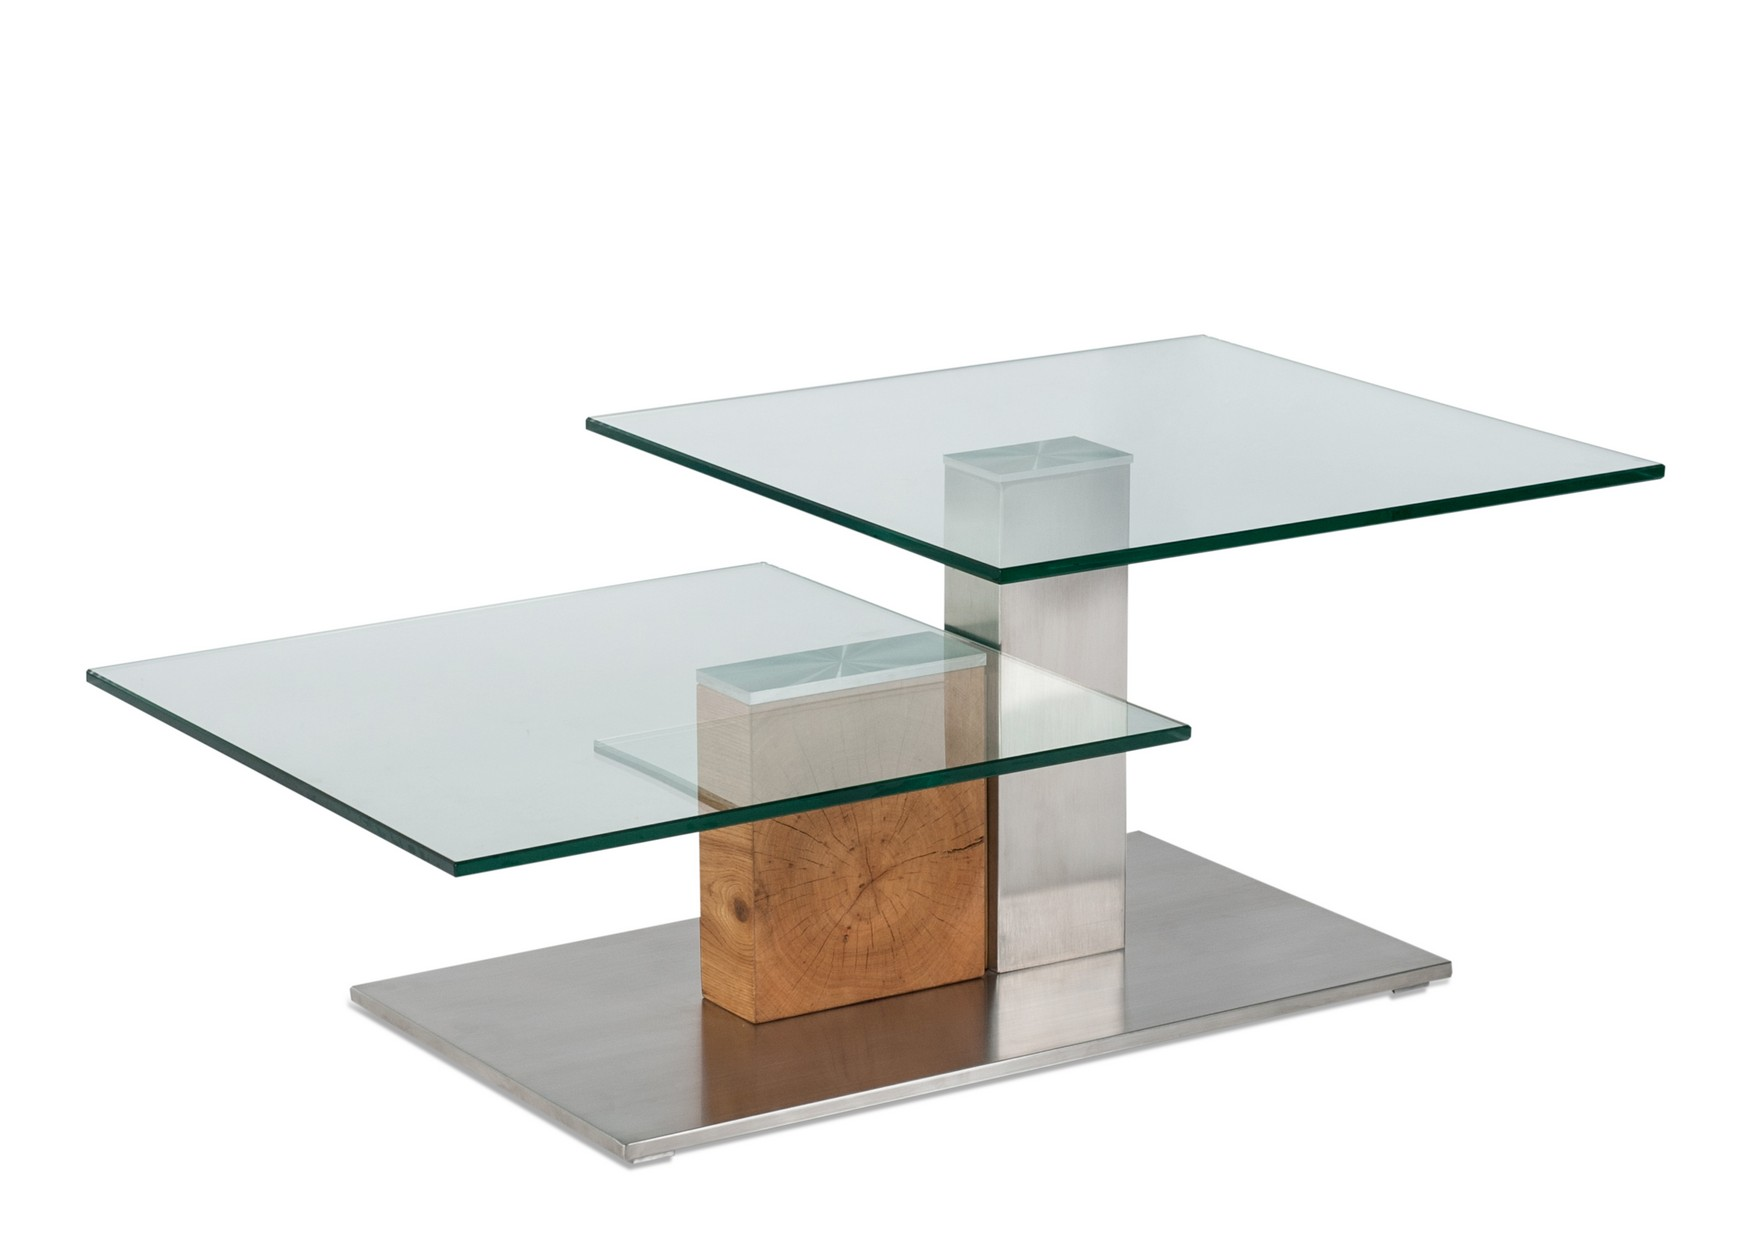 Design Glastisch - Klarglas 12 mm + Edelstahl Bodenplatte